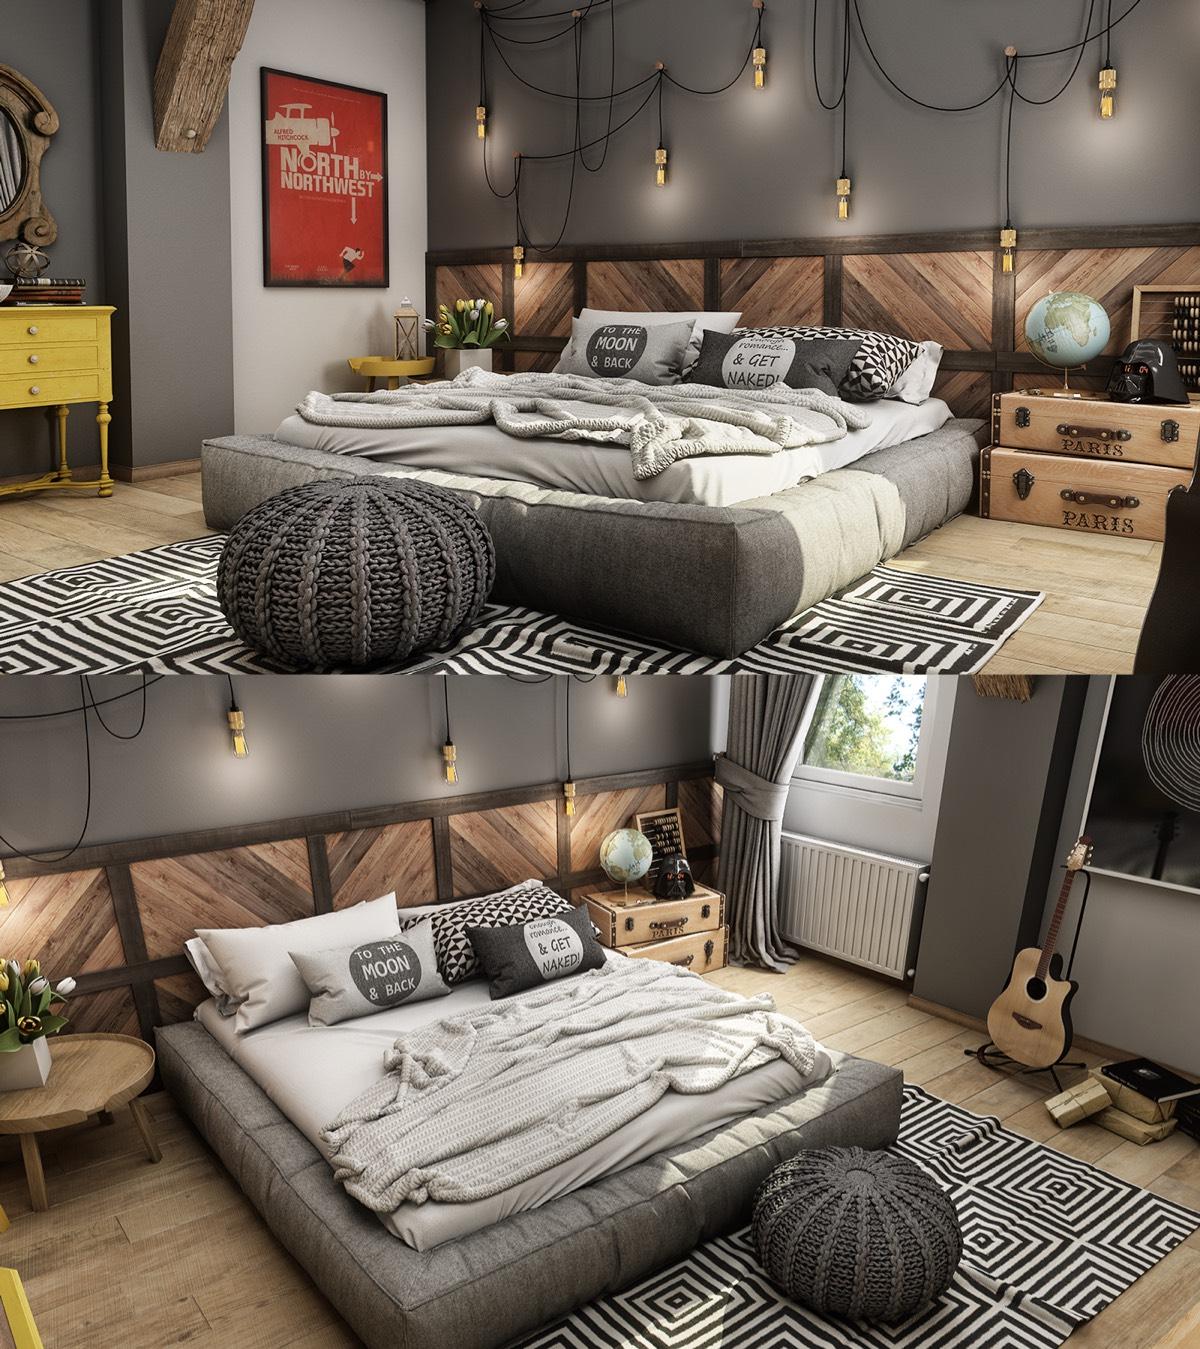 7 bedroom design ideas for teenage